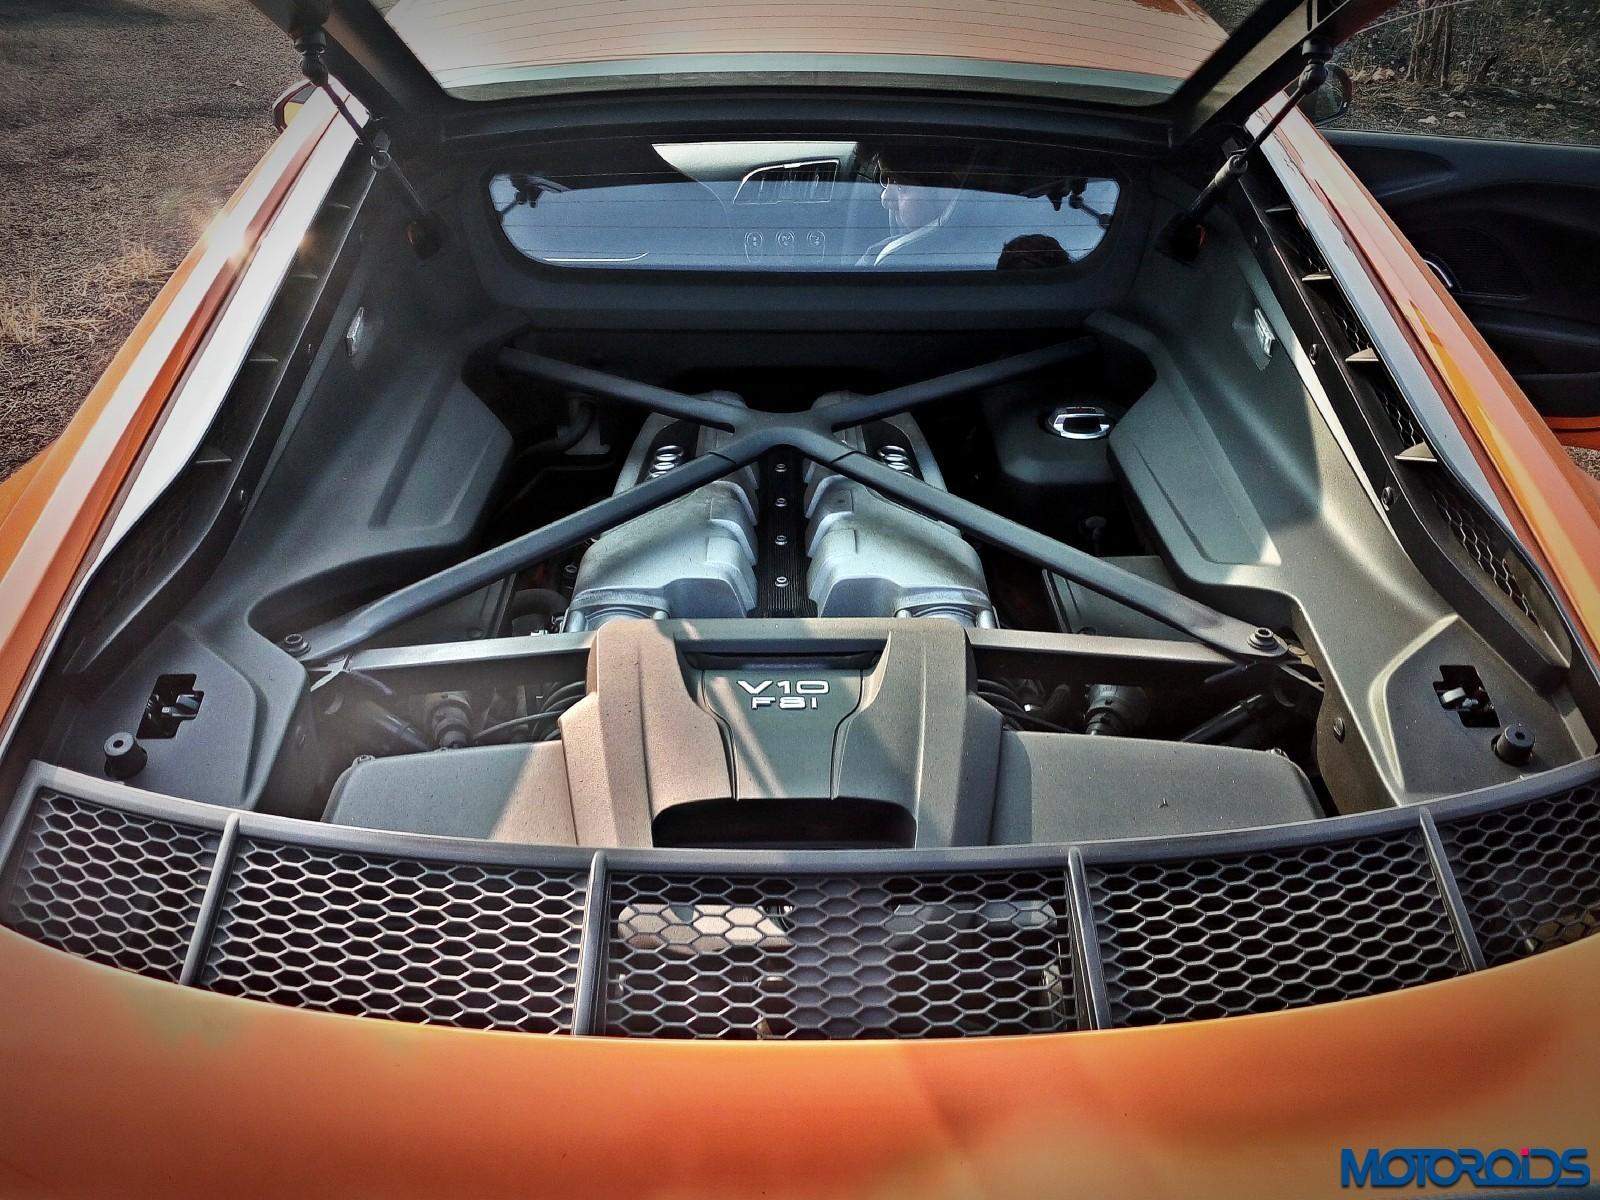 New-Audi-R8-V10-Plus-engine